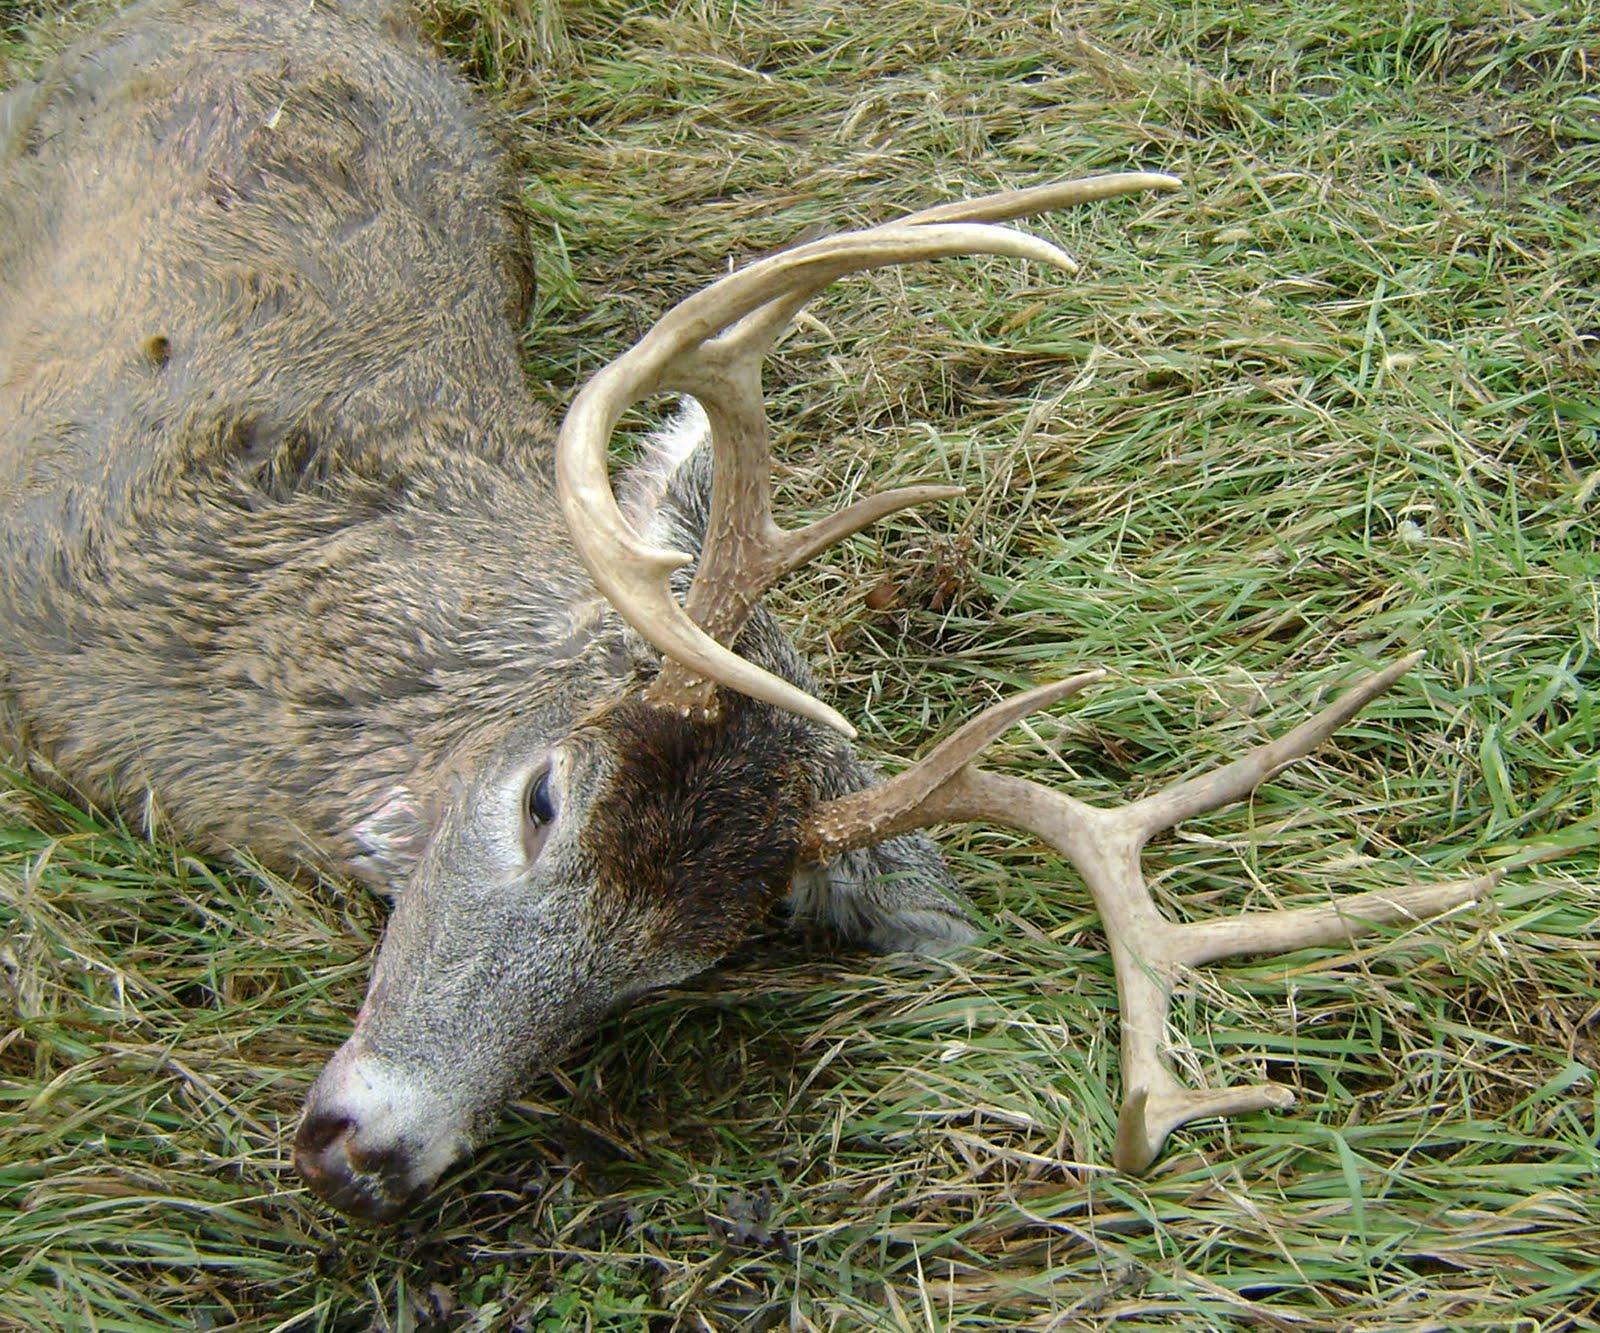 silver edition deer feeders photos hoarders banquet boss brown feed hero cooper feeder potts horn gopro store buck banner